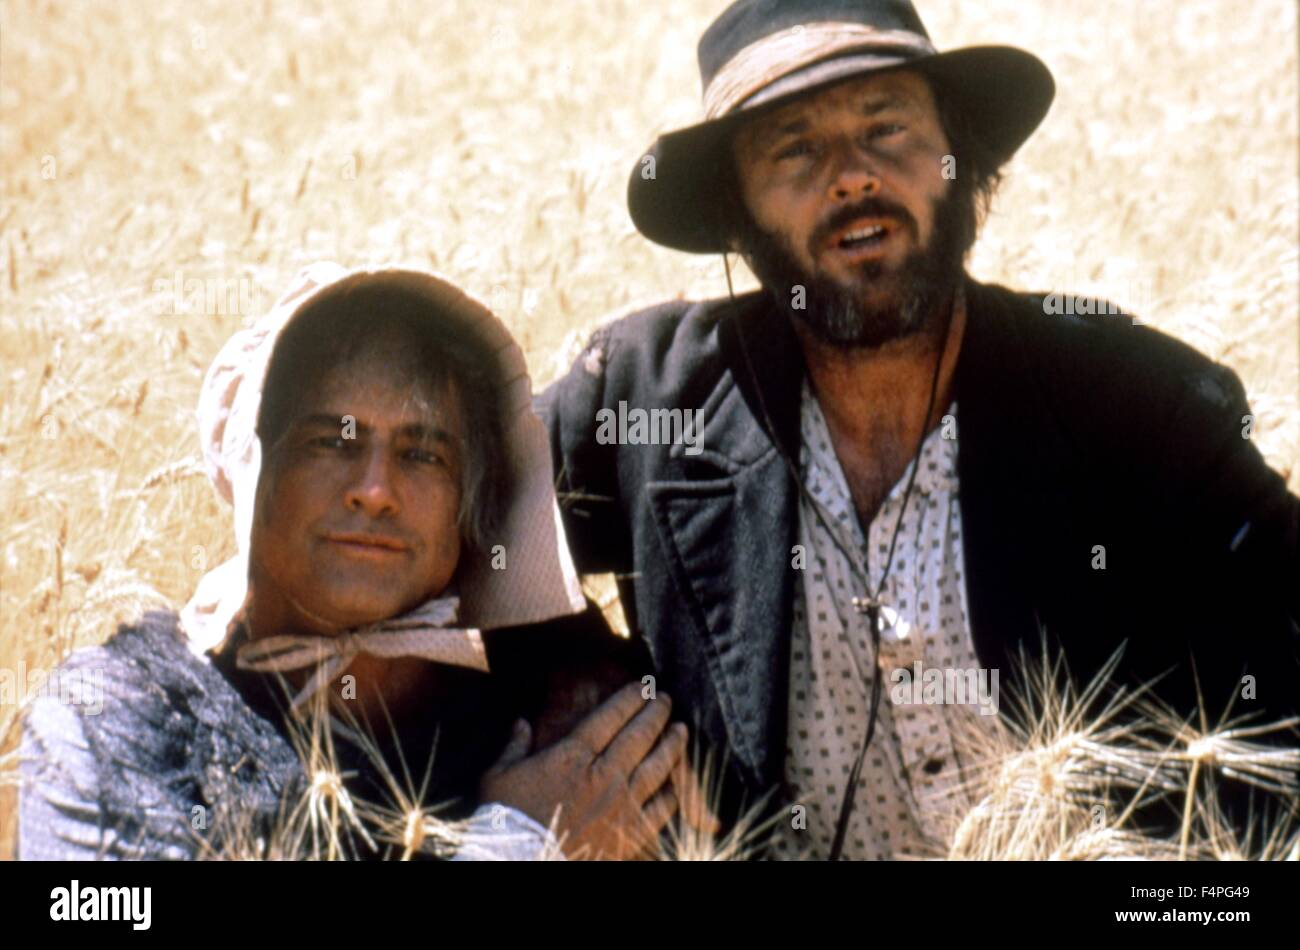 Marlon Brando and Jack Nicholson / The Missouri Breaks / 1976 directed by  Arthur Penn - Stock Image